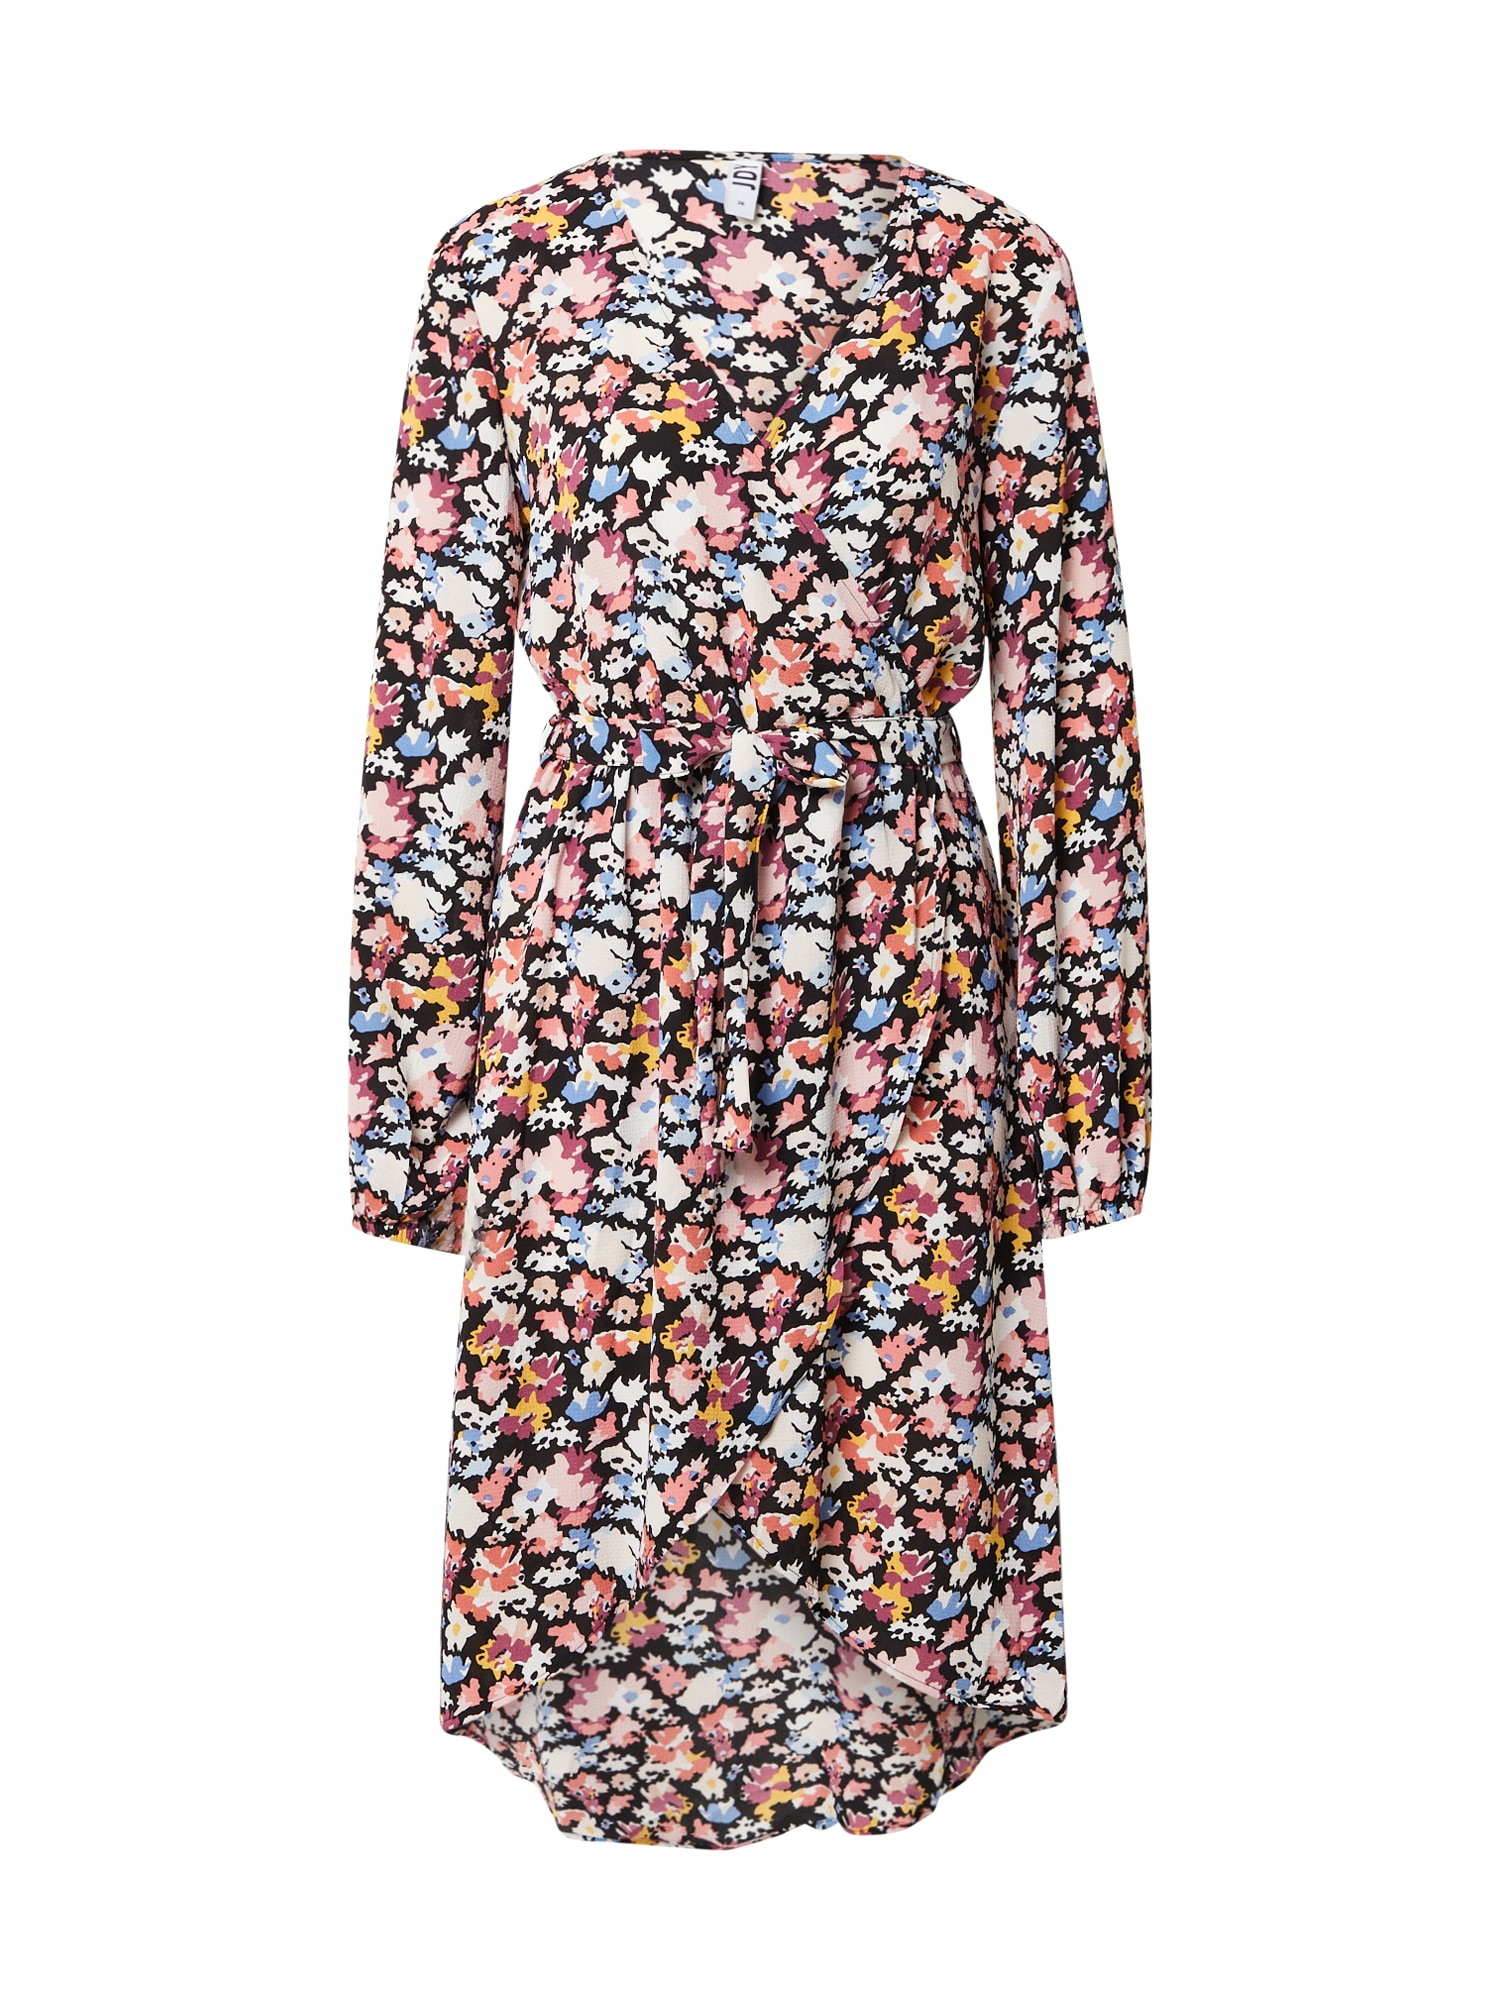 JDY Šaty 'ROXANNE'  černá / pink / bílá / žlutá / světlemodrá